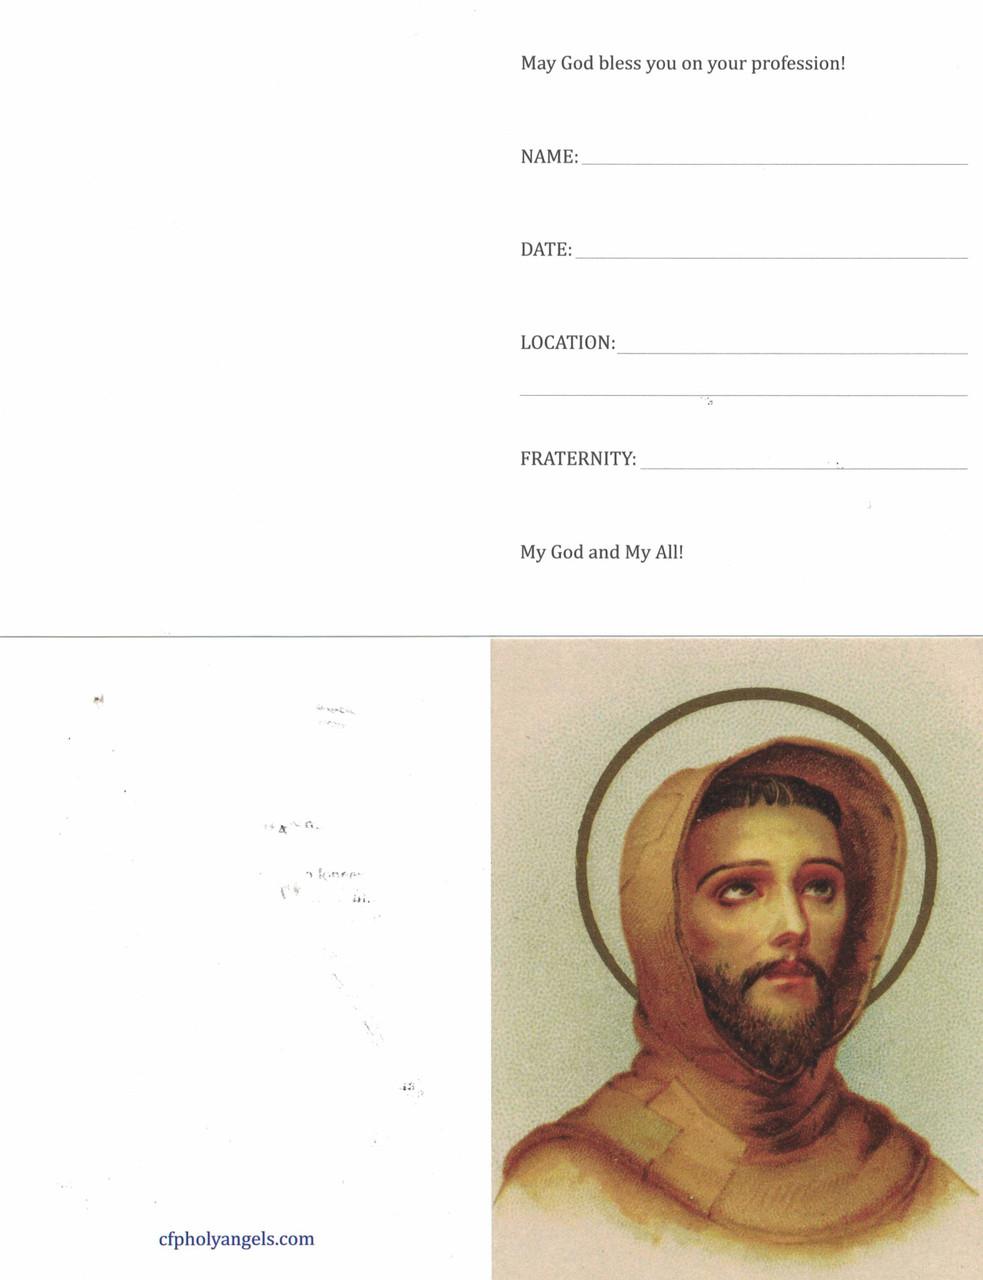 Saint Francis Franciscan Order Profession Card